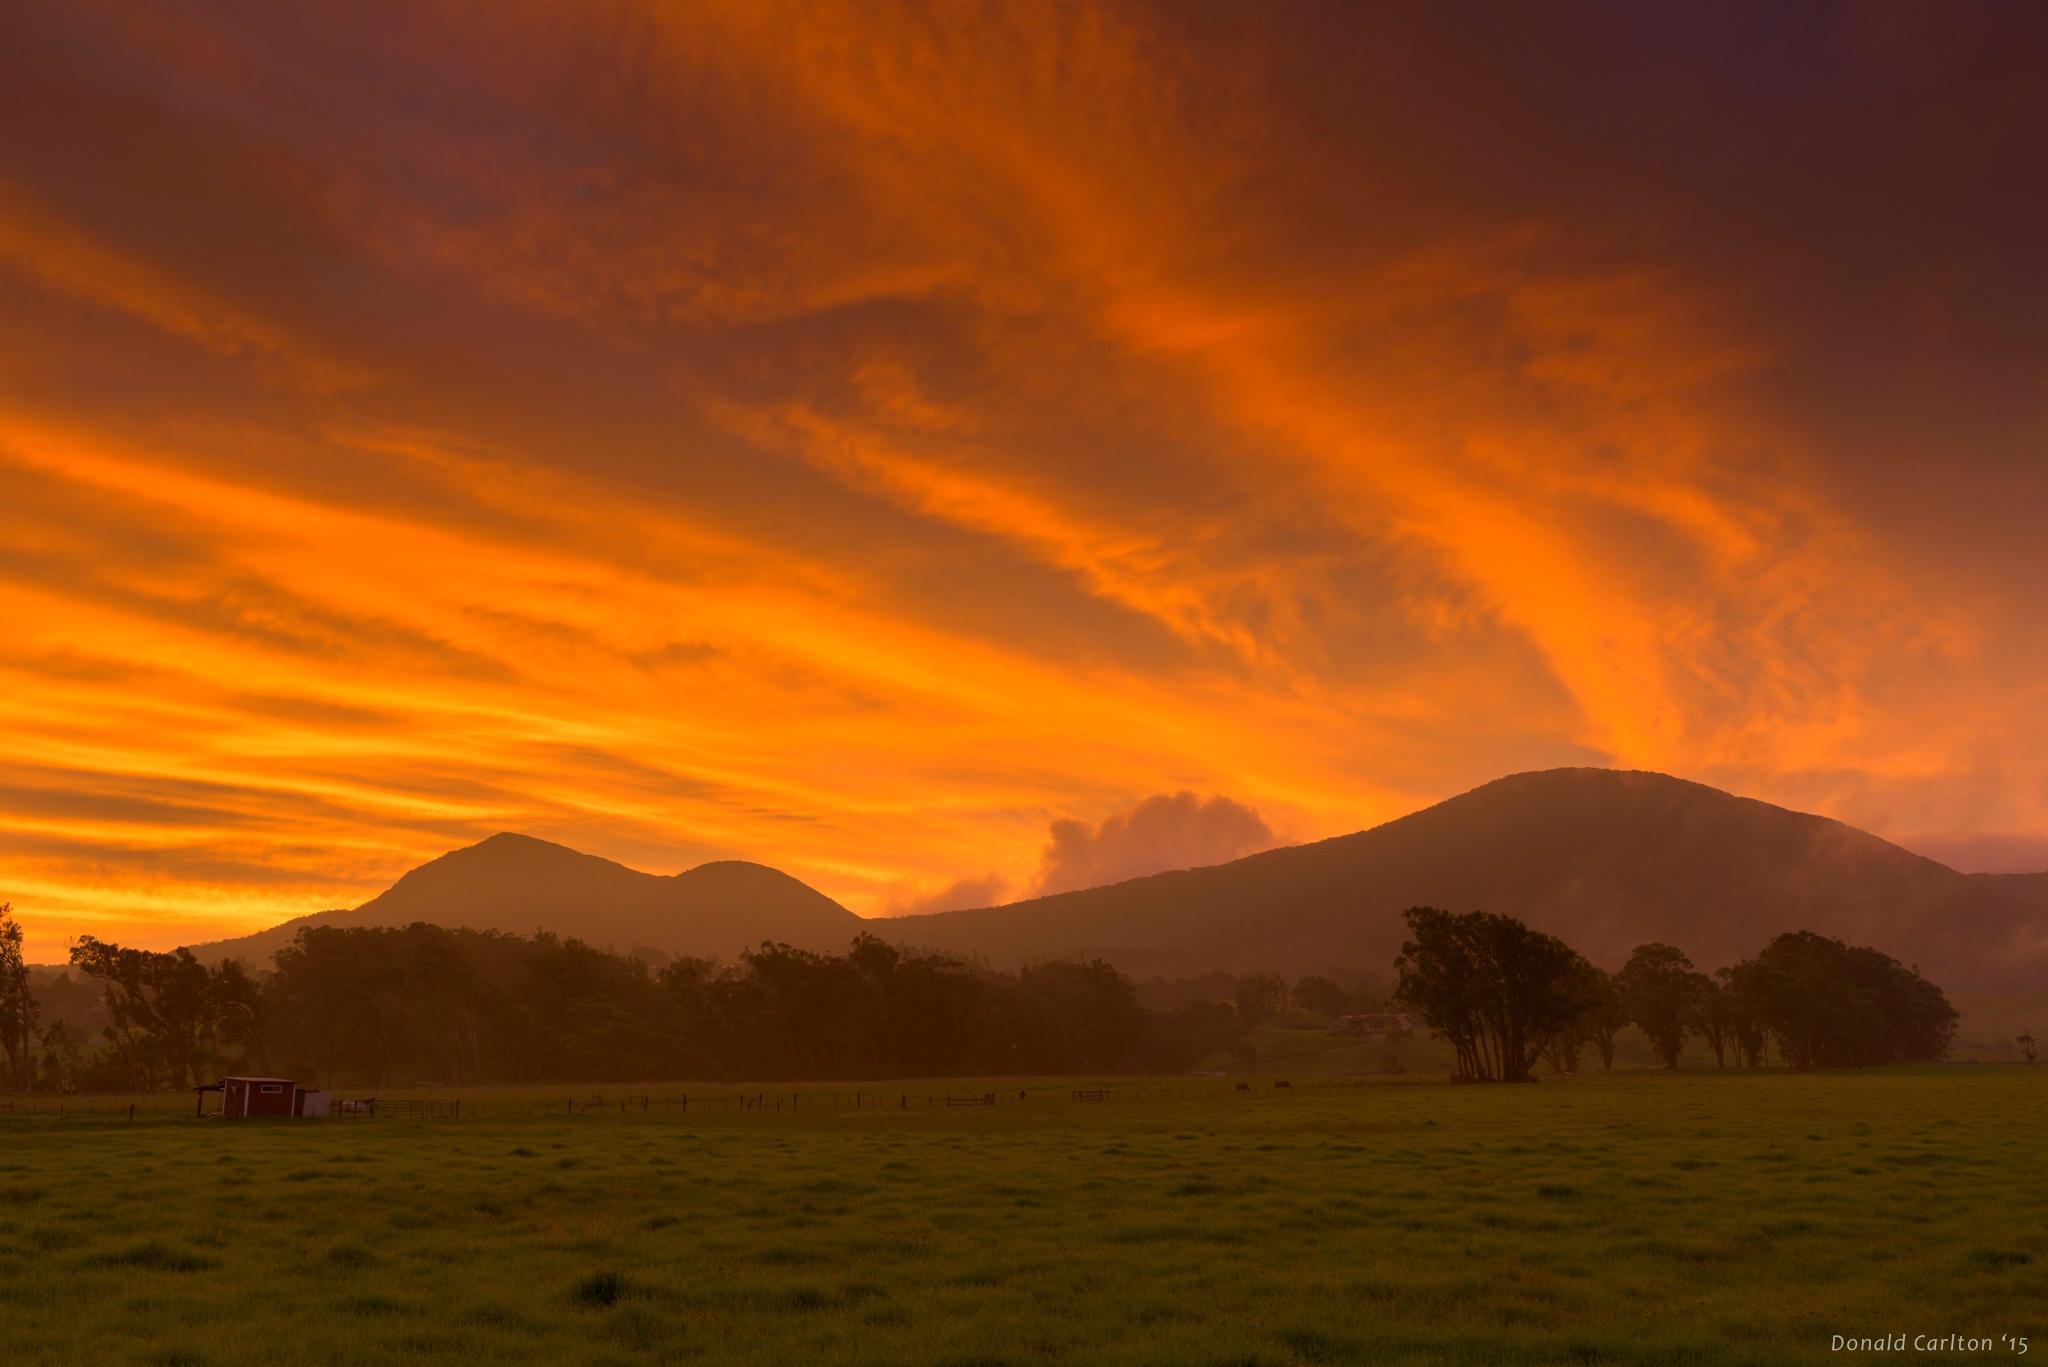 Donald _Carlton_Landscape-030.jpg